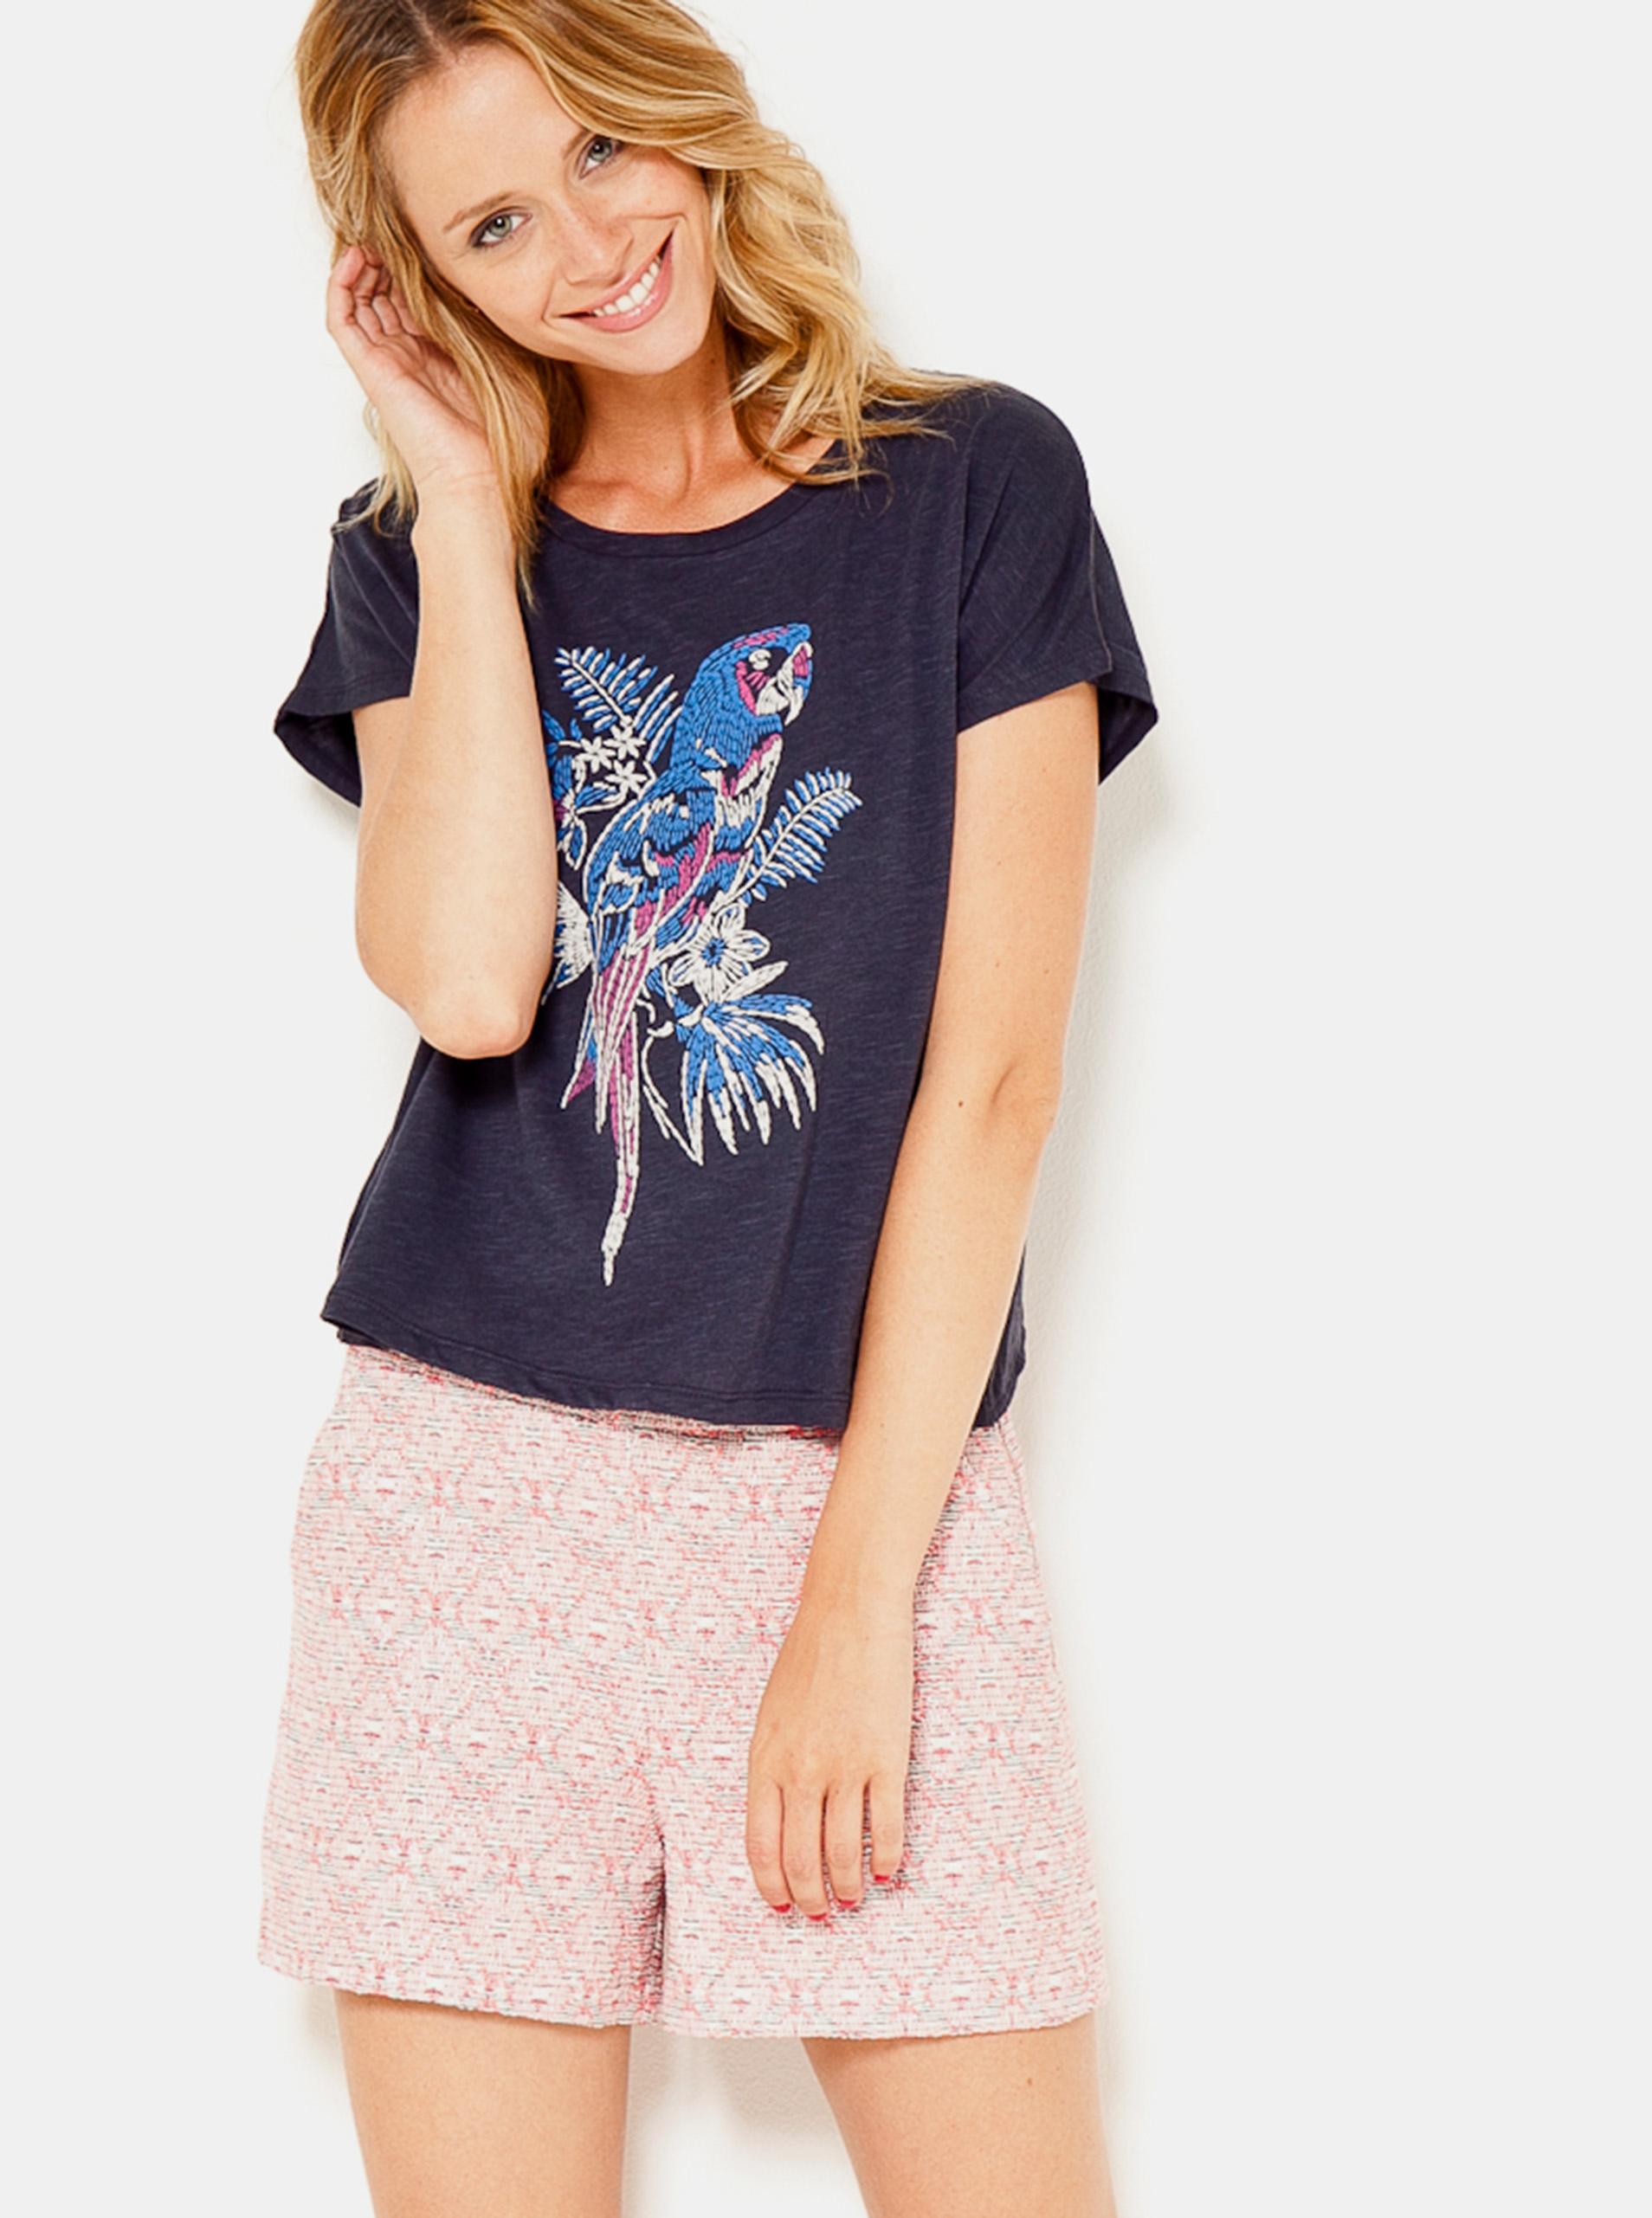 CAMAIEU blue women´s T-shirt with print